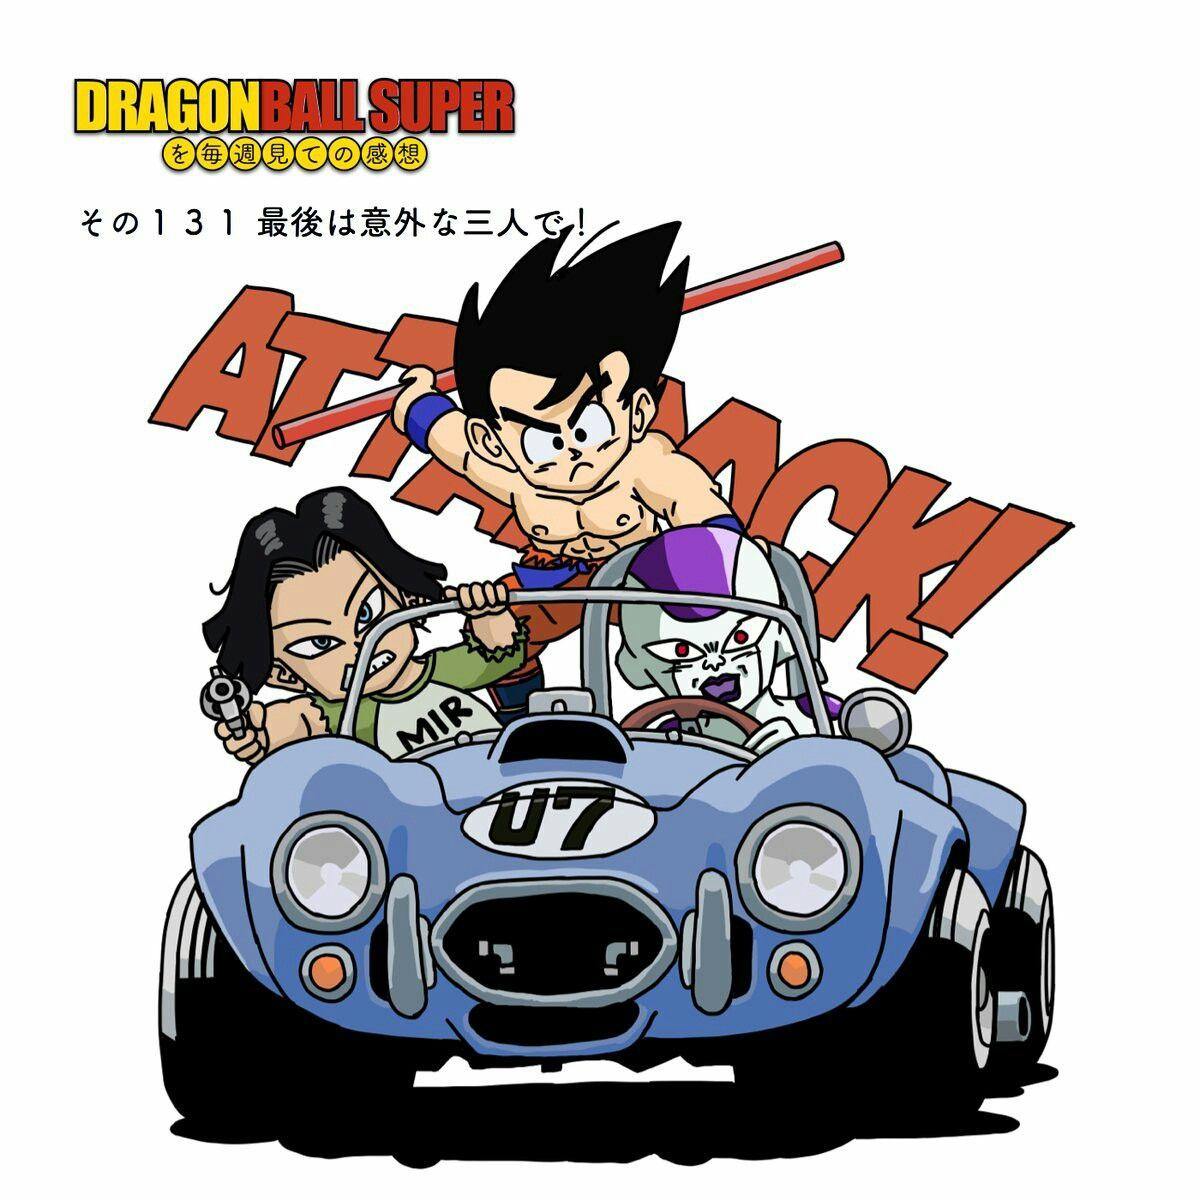 Goku, Freezer & Androide 17